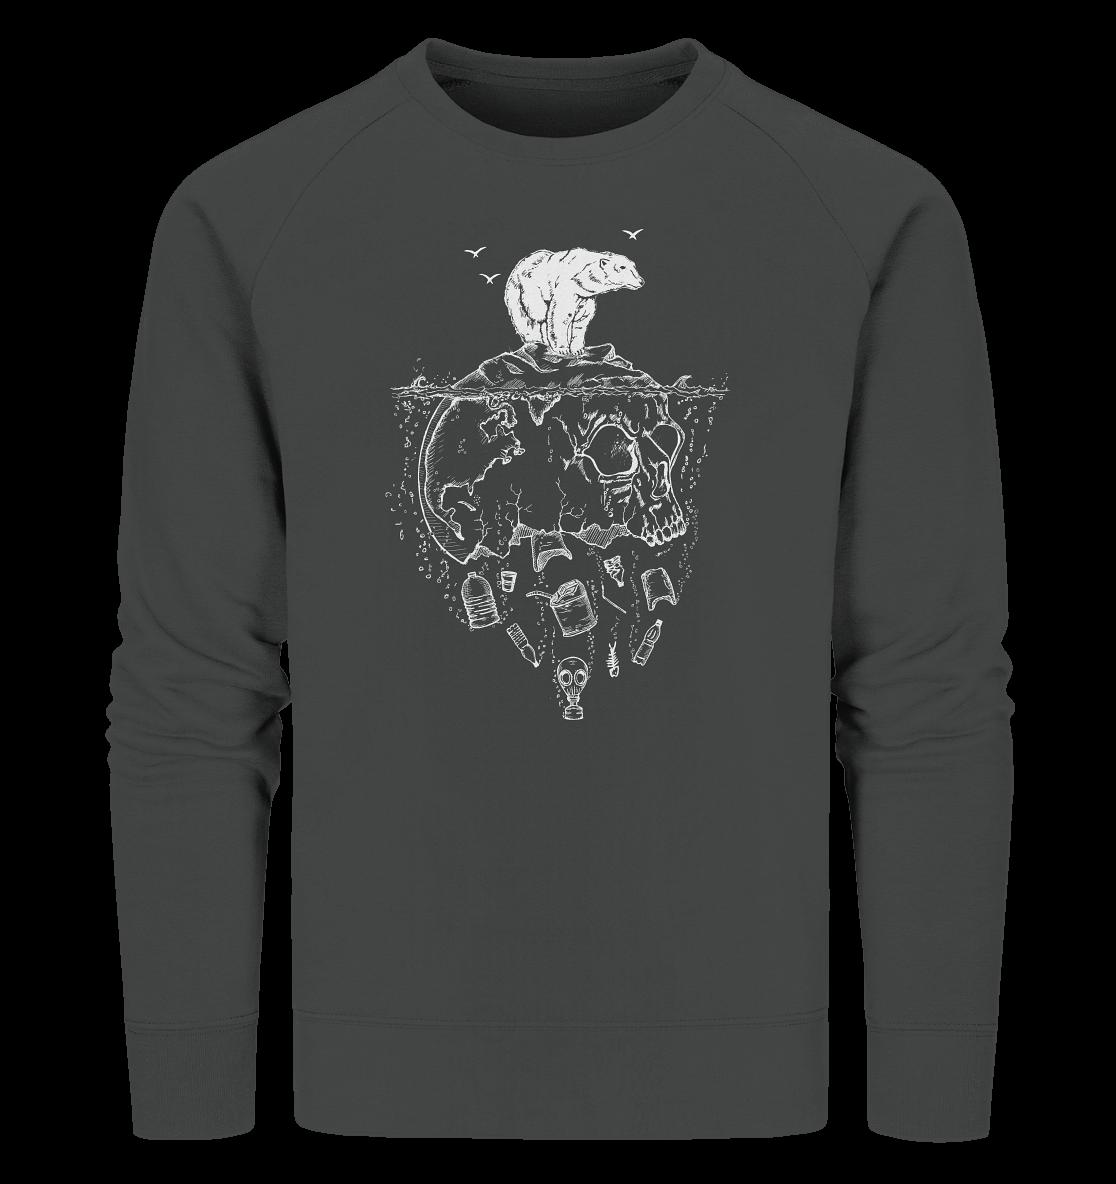 front-organic-sweatshirt-444545-1116x-4.png